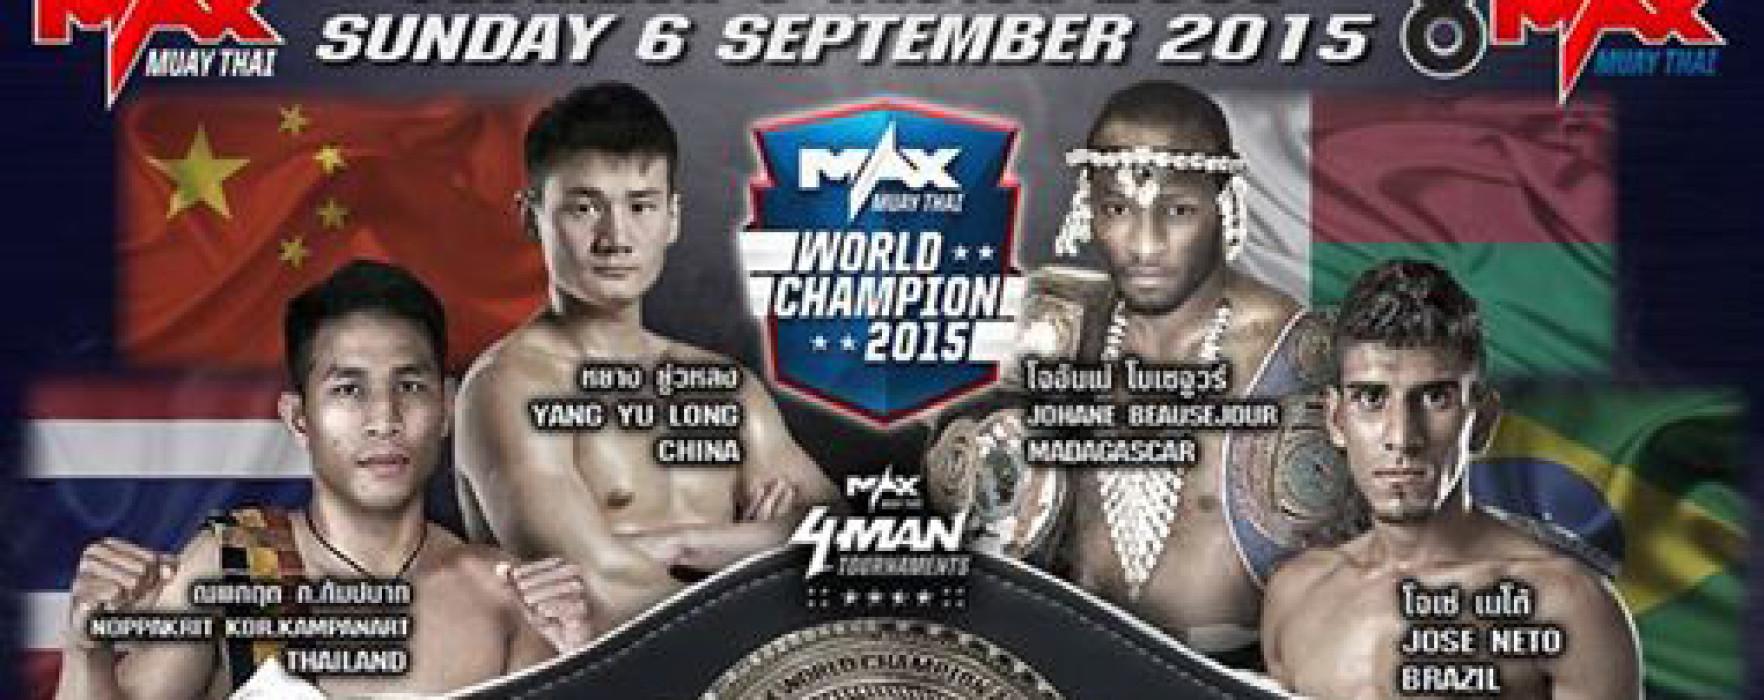 Flash News: Franco 7MT, Josè Neto, Jayy Tonkin, Teetong Por Rungsawat at Max Muay Thai